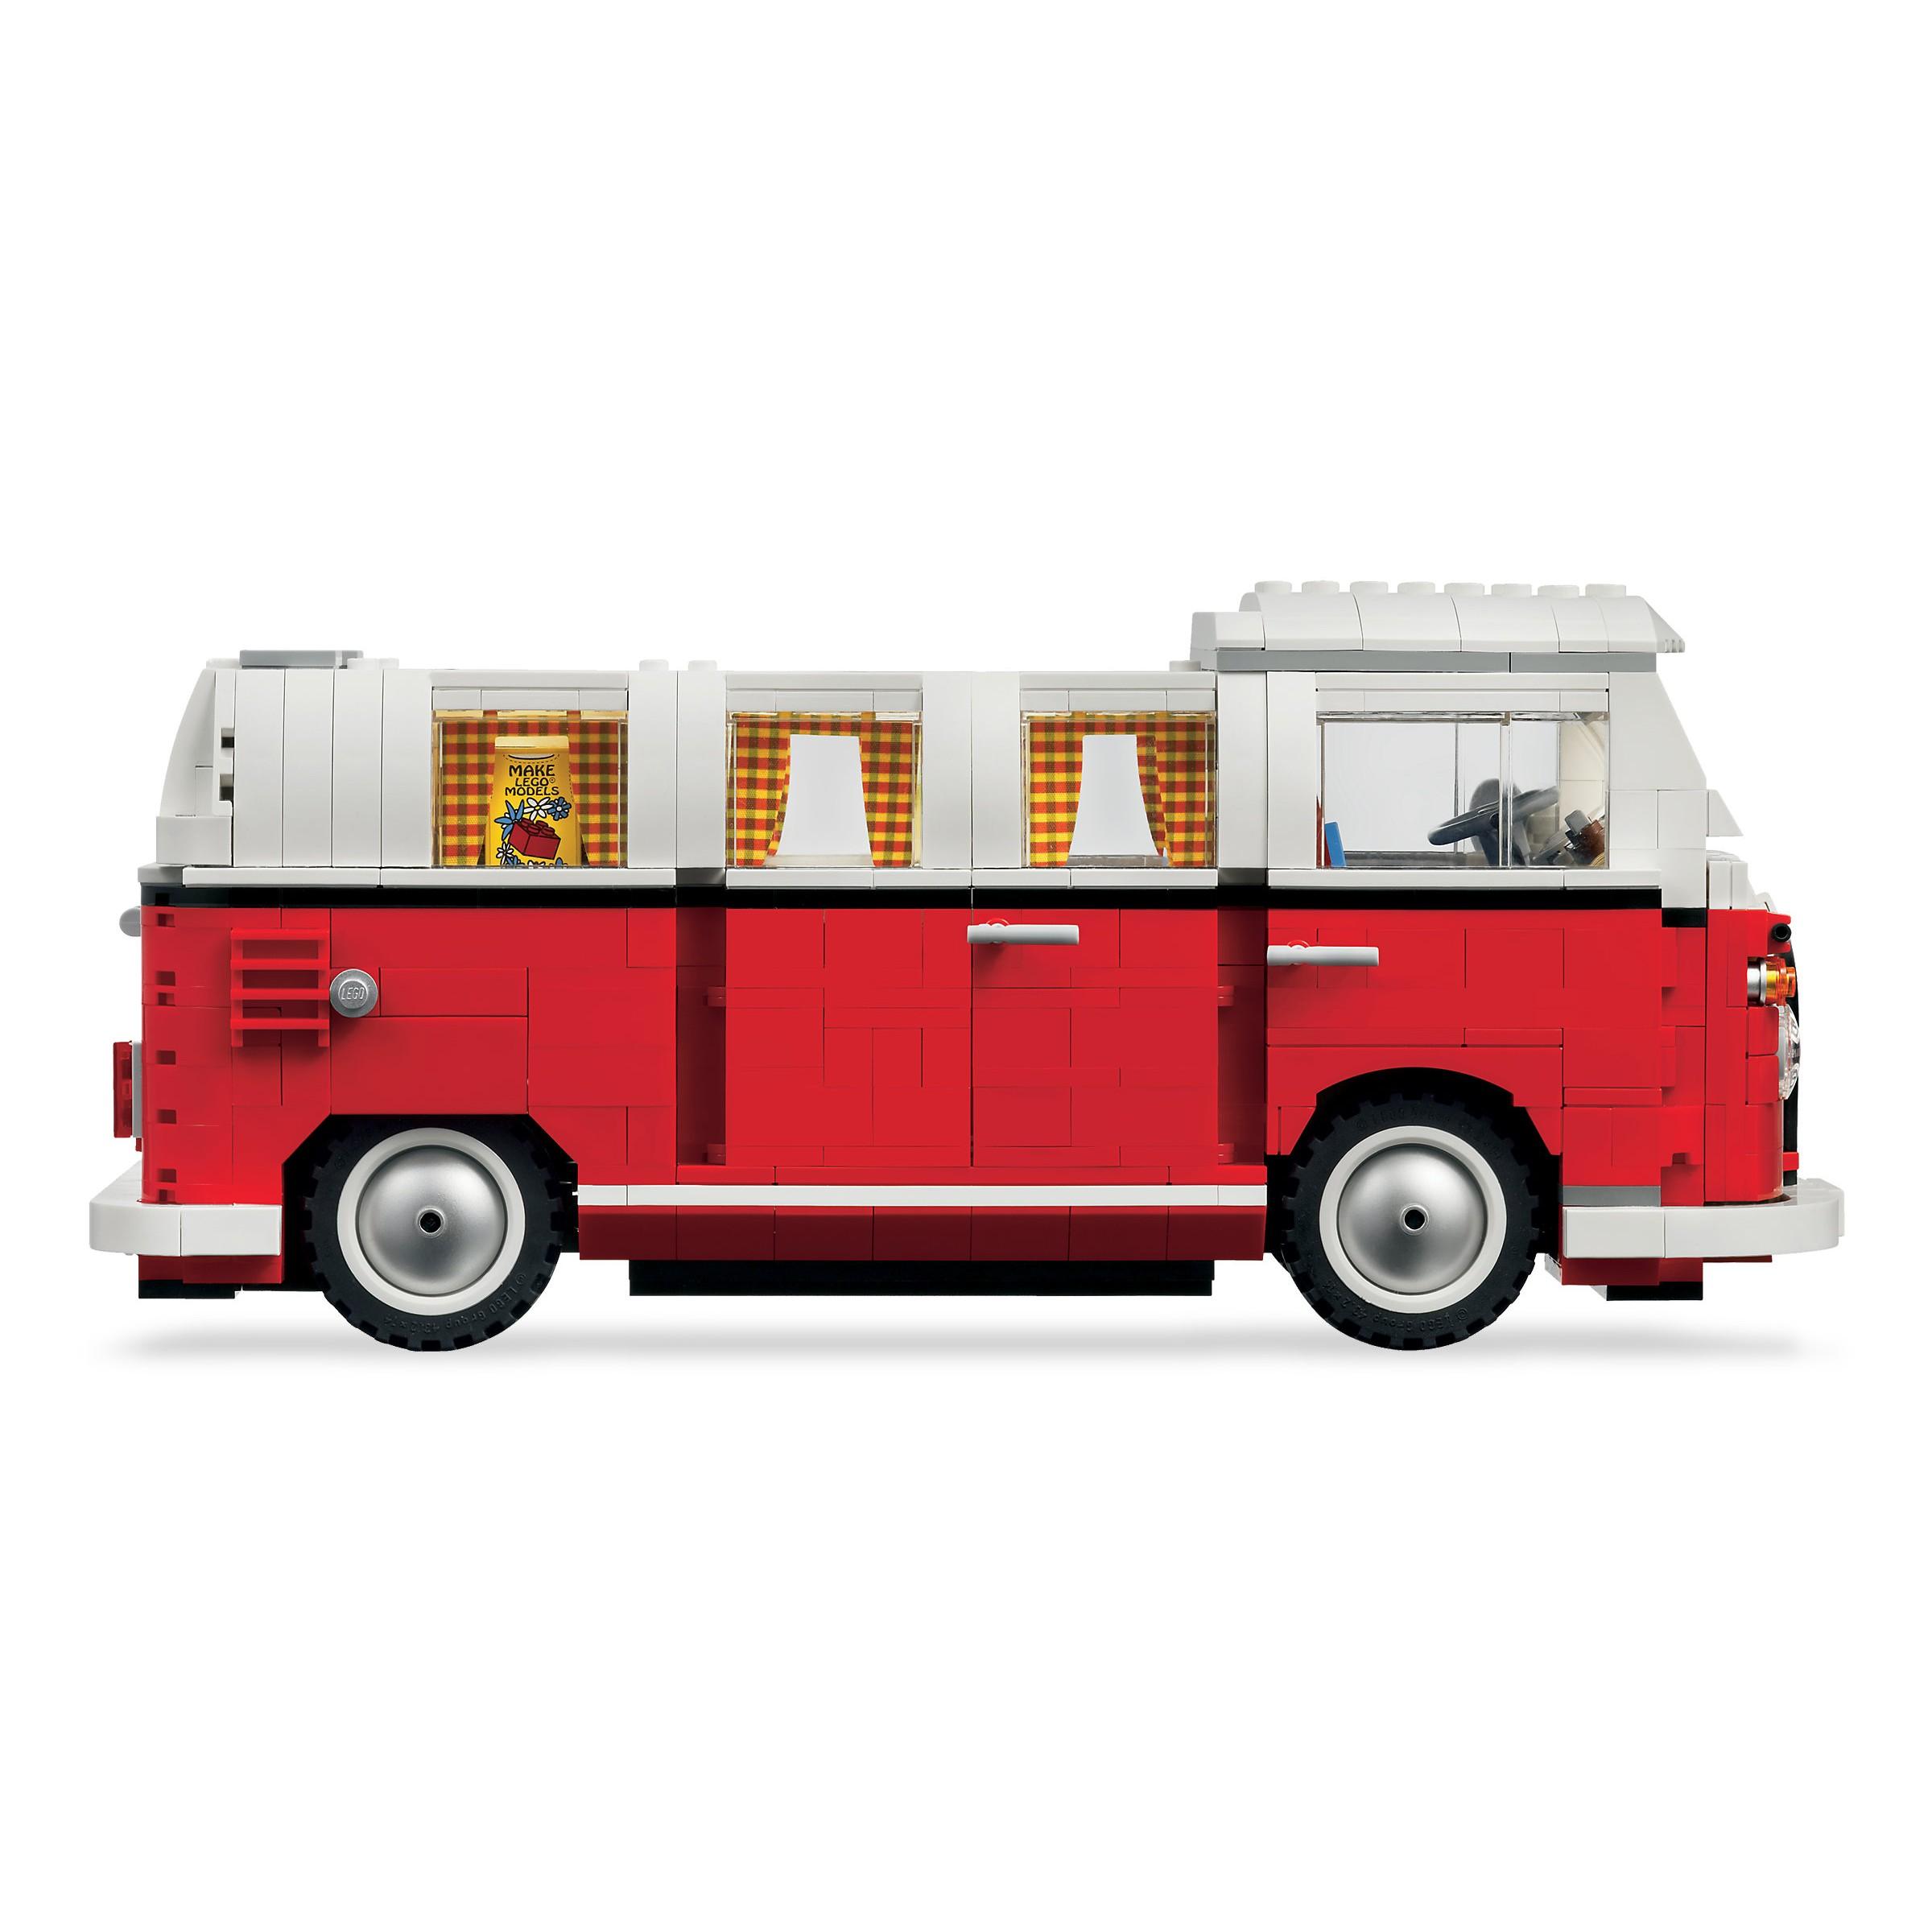 lego 10220 creator volkswagen t1 camper kombi van at hobby. Black Bedroom Furniture Sets. Home Design Ideas